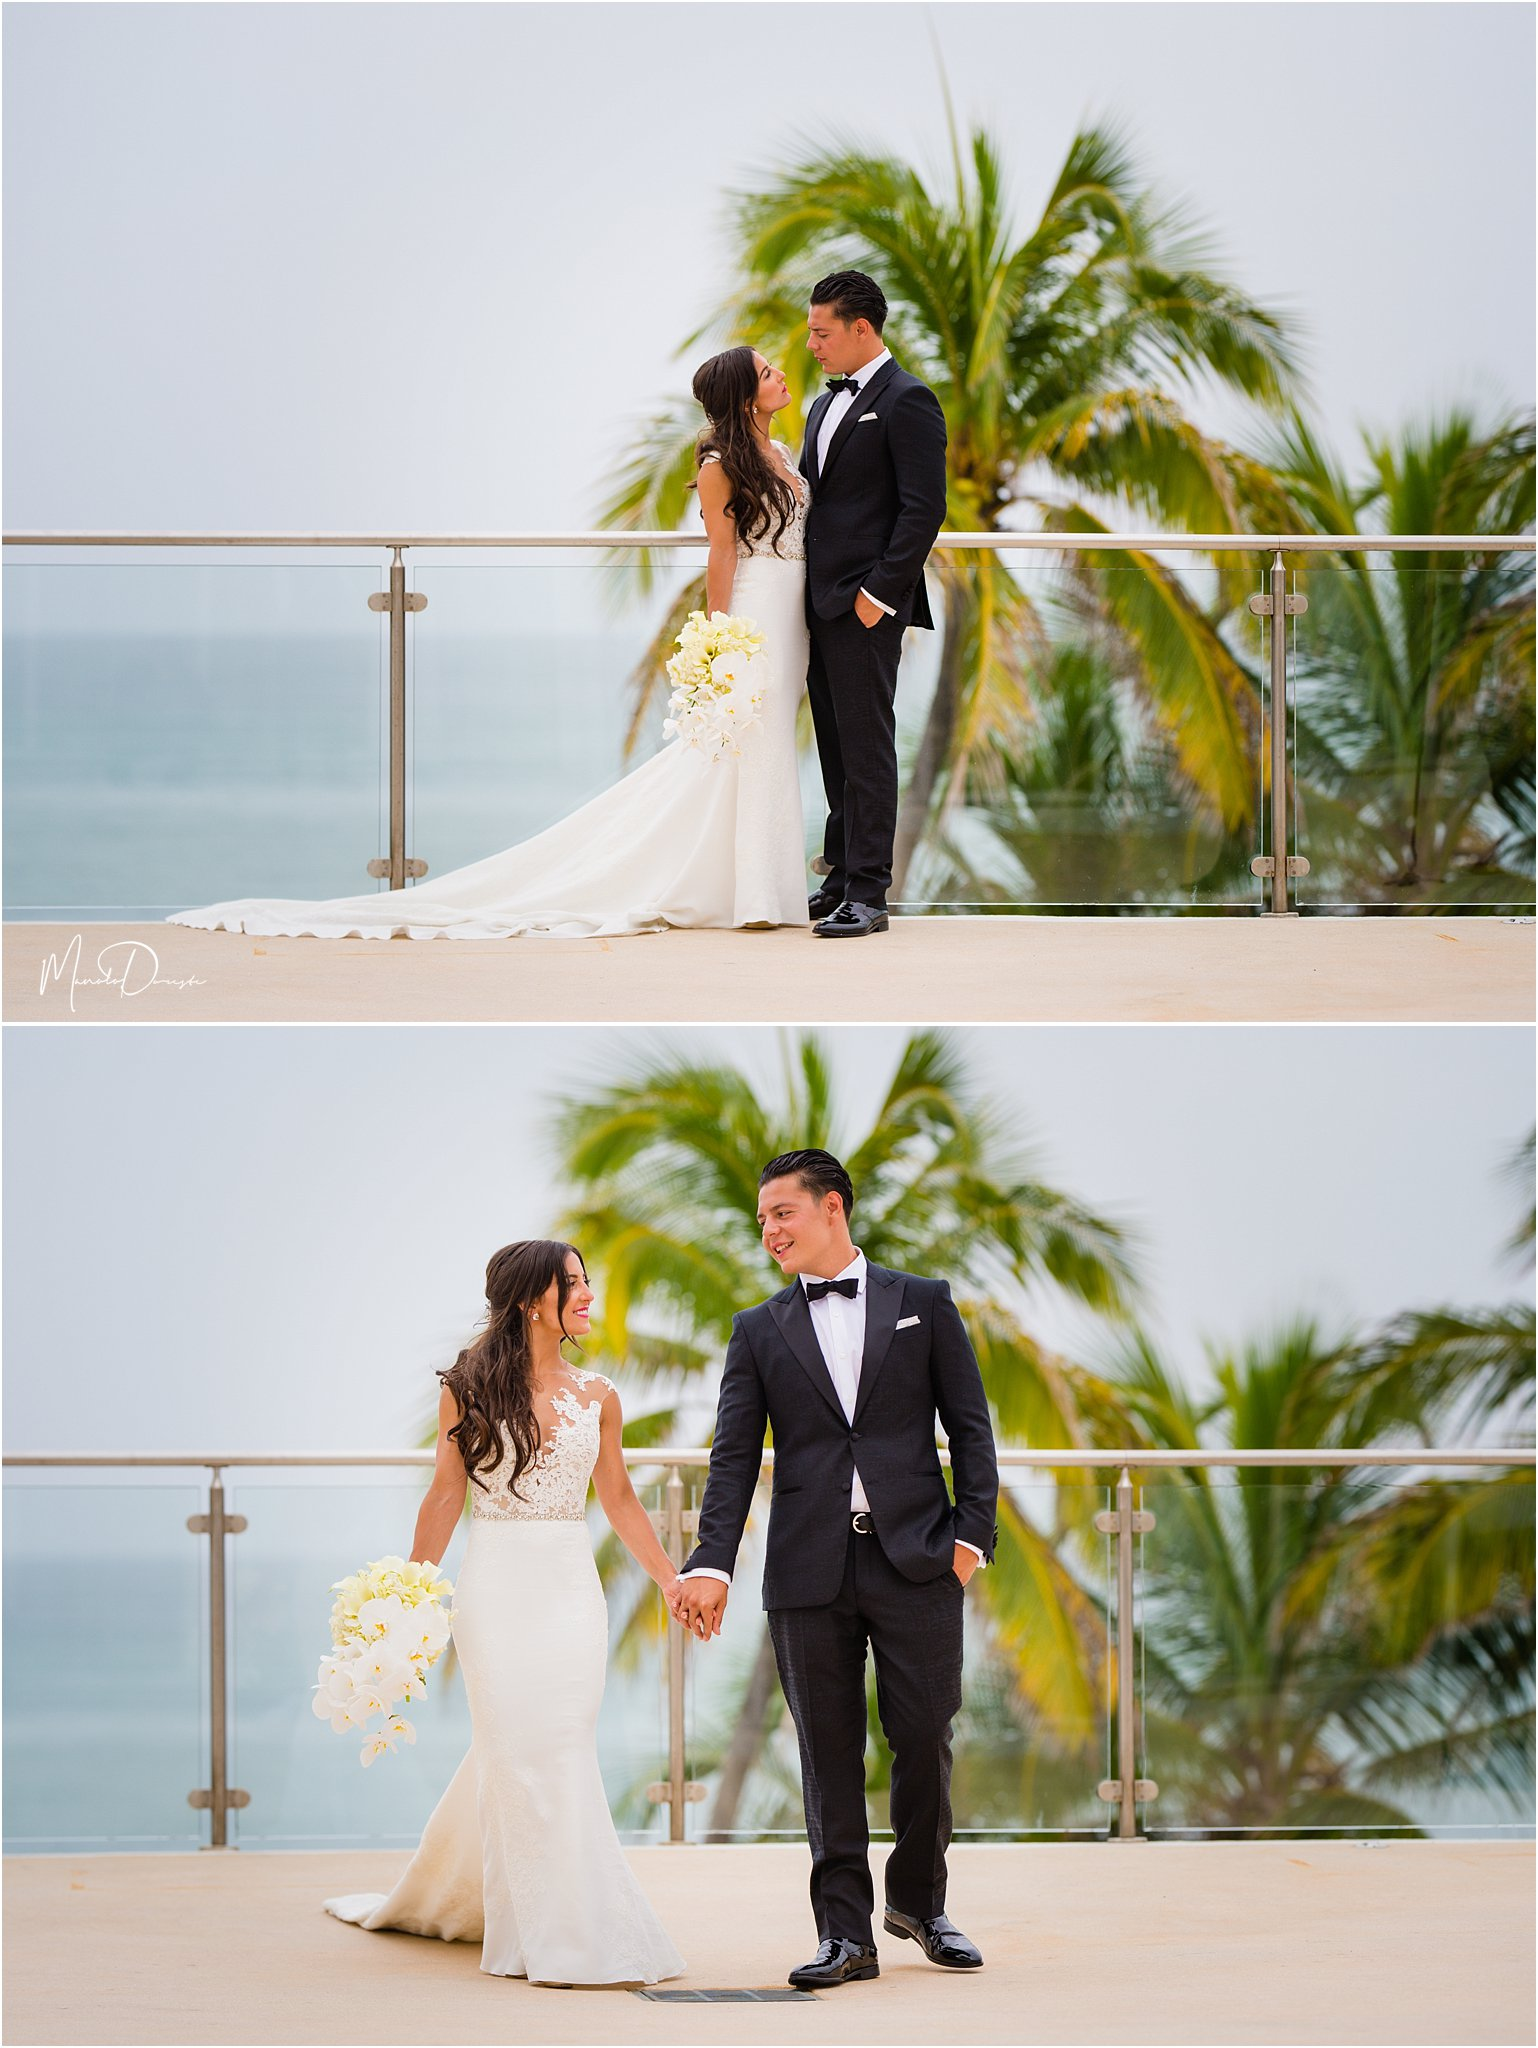 0326_ManoloDoreste_InFocusStudios_Wedding_Family_Photography_Miami_MiamiPhotographer.jpg